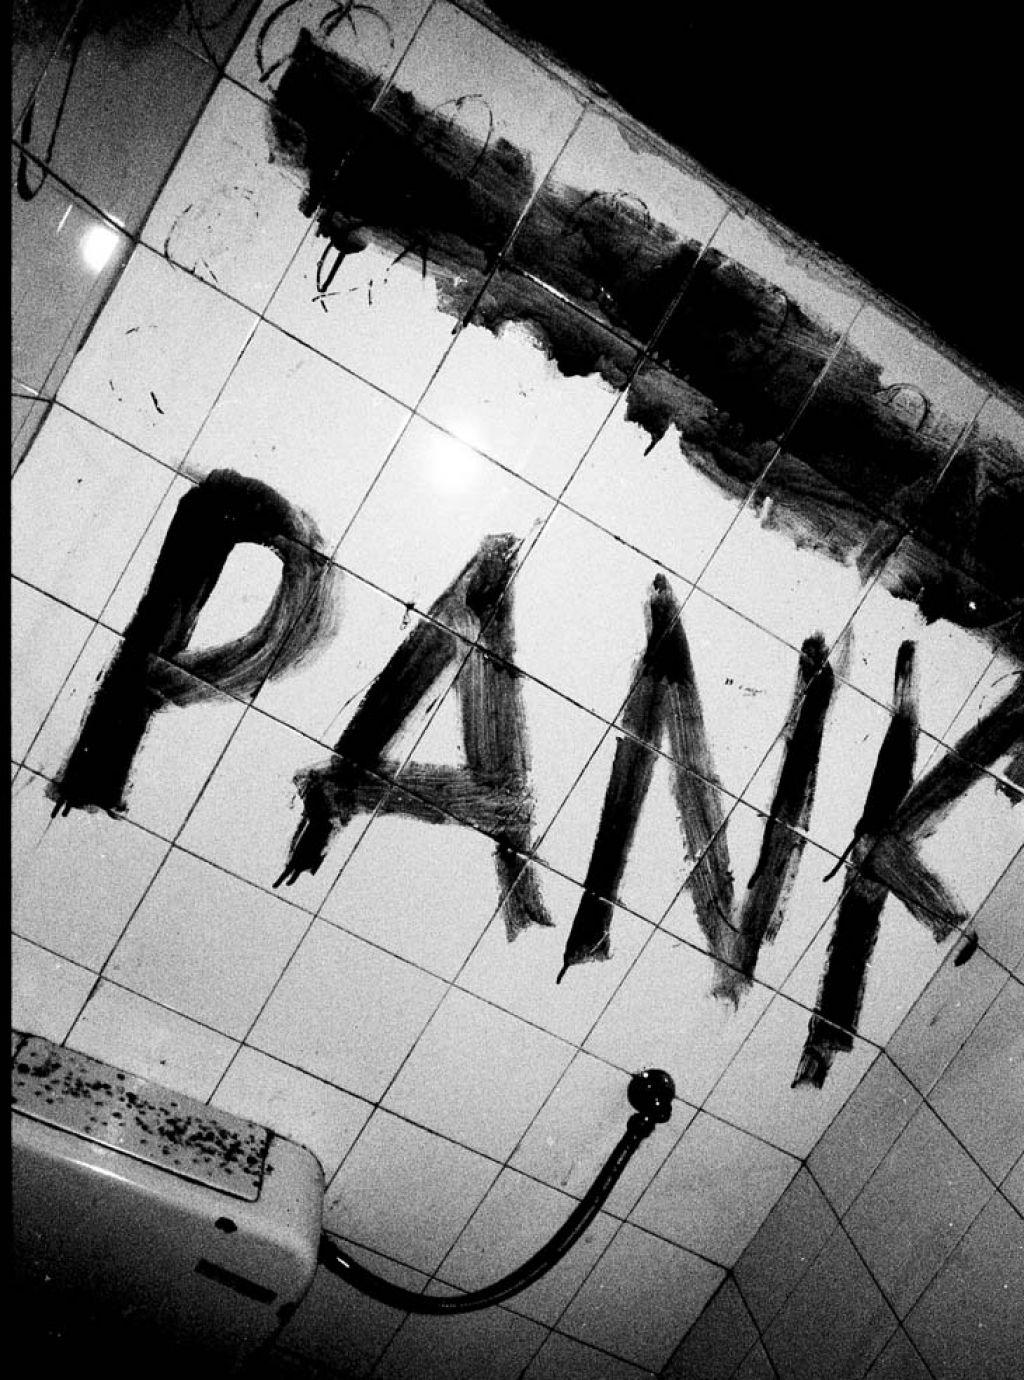 Balkan Pank II: Knjiga o punku ali punk knjiga?